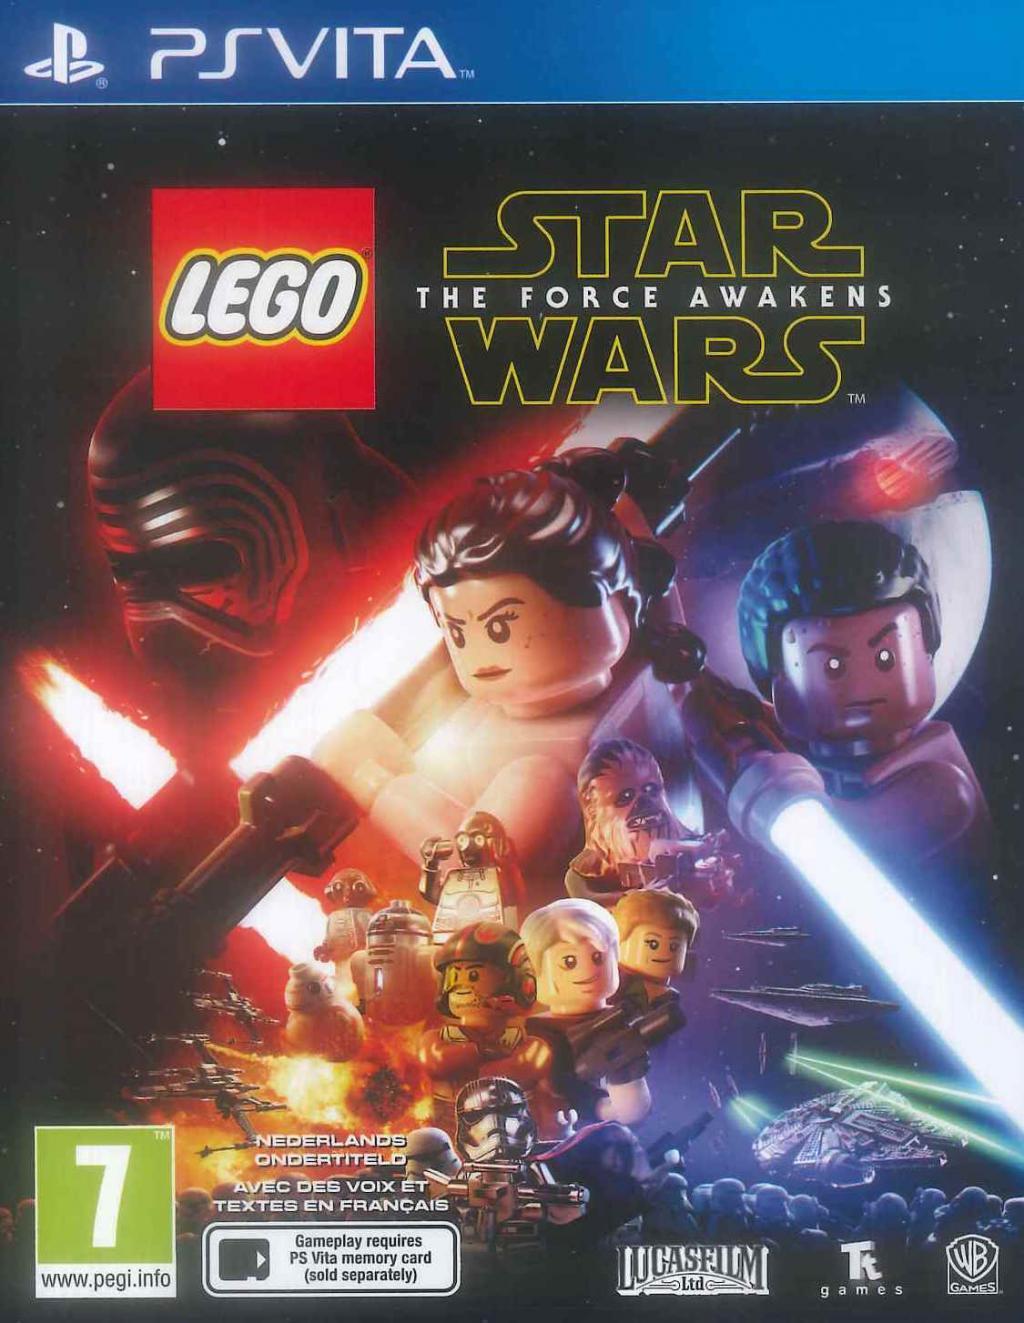 LEGO Star Wars the Force Awakens_1